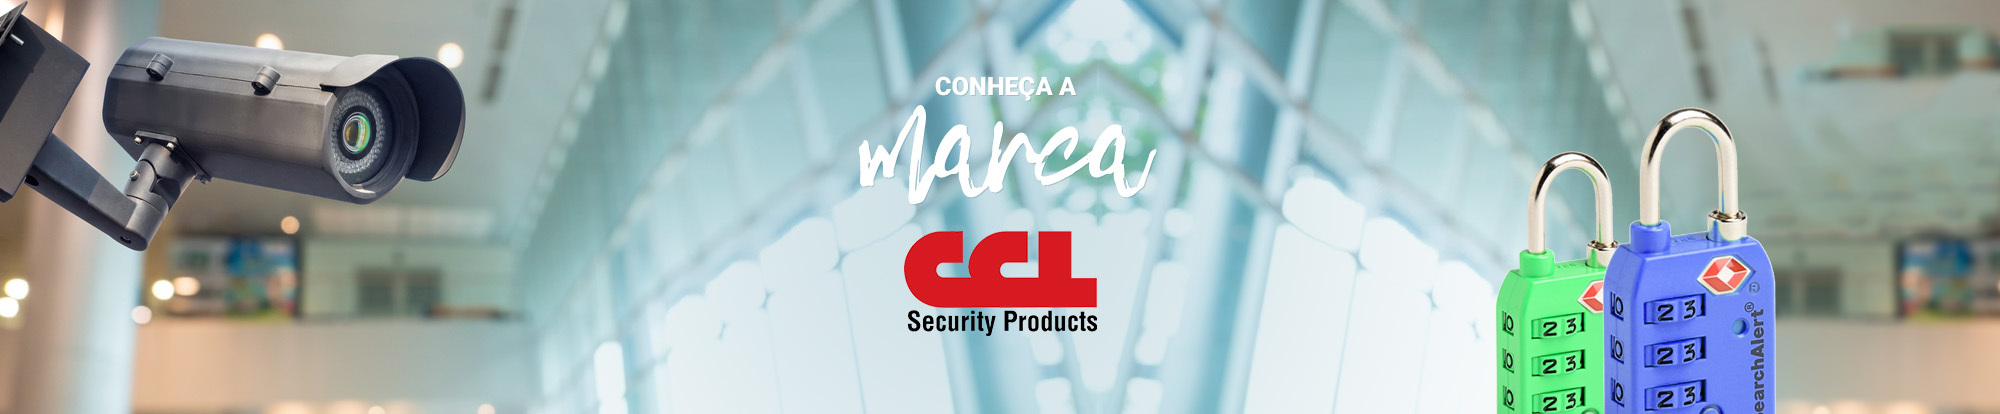 Banner Marca CCL